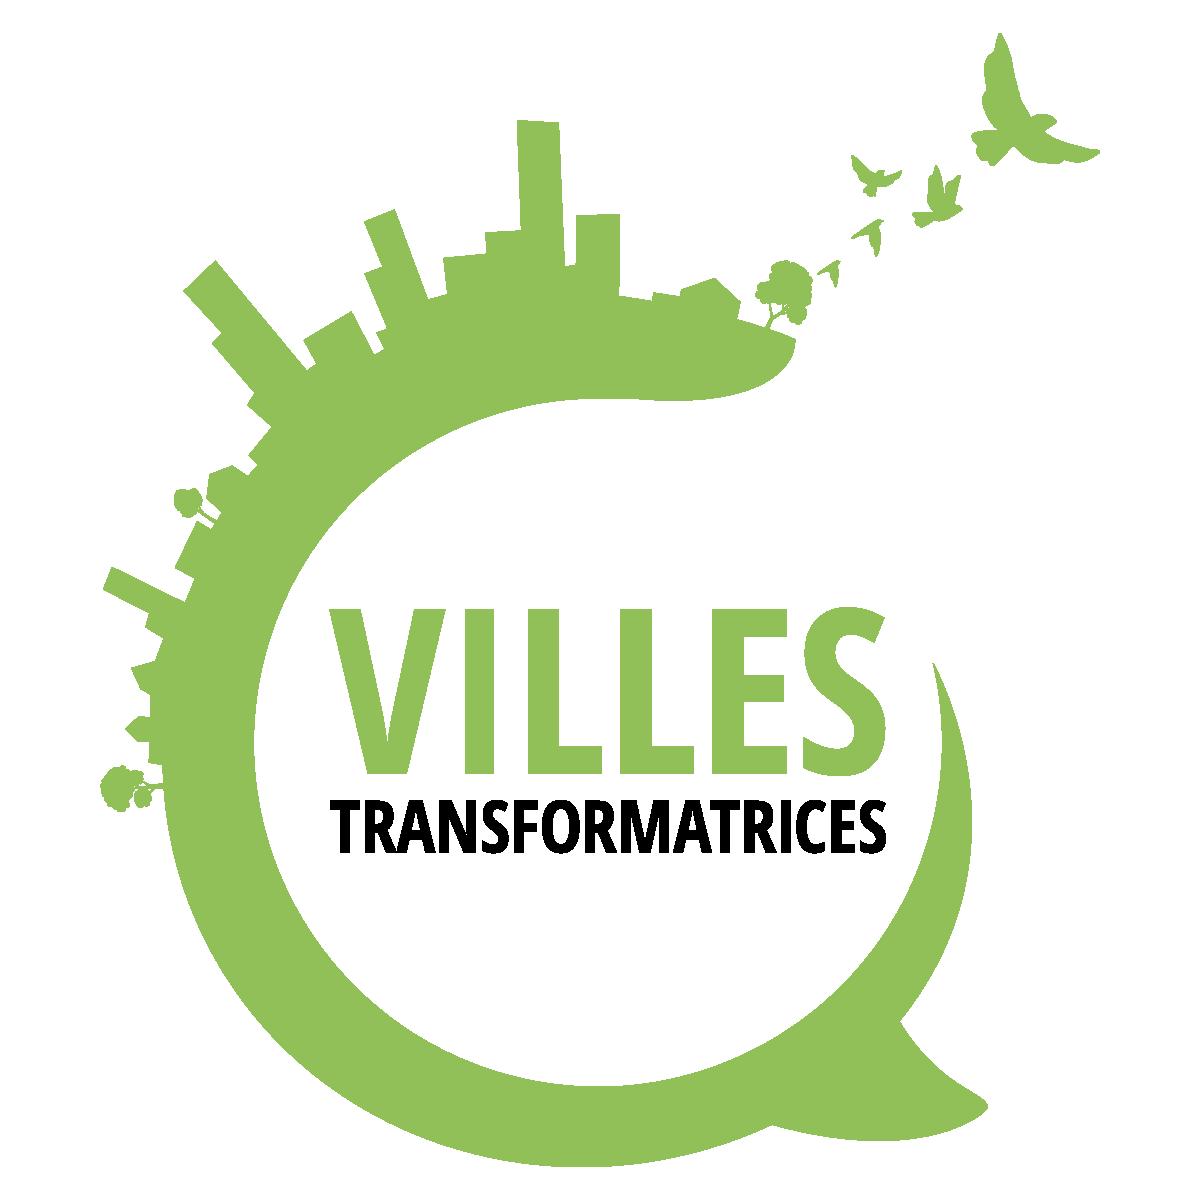 Villes Transformatrices